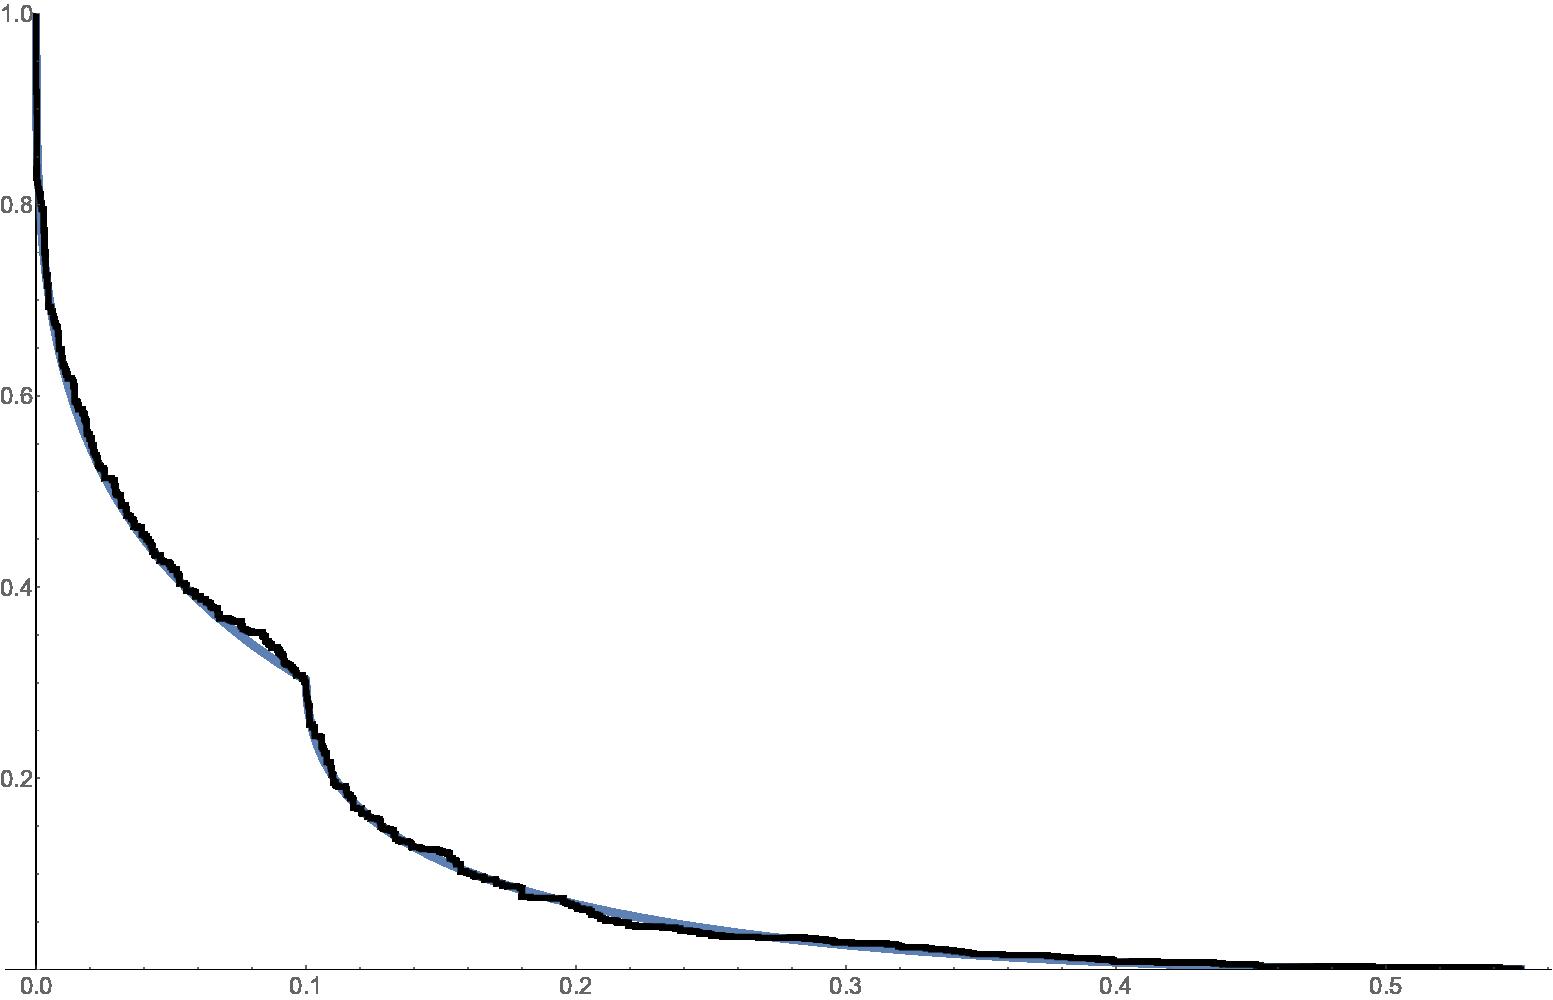 Mild slowdown (about critical)